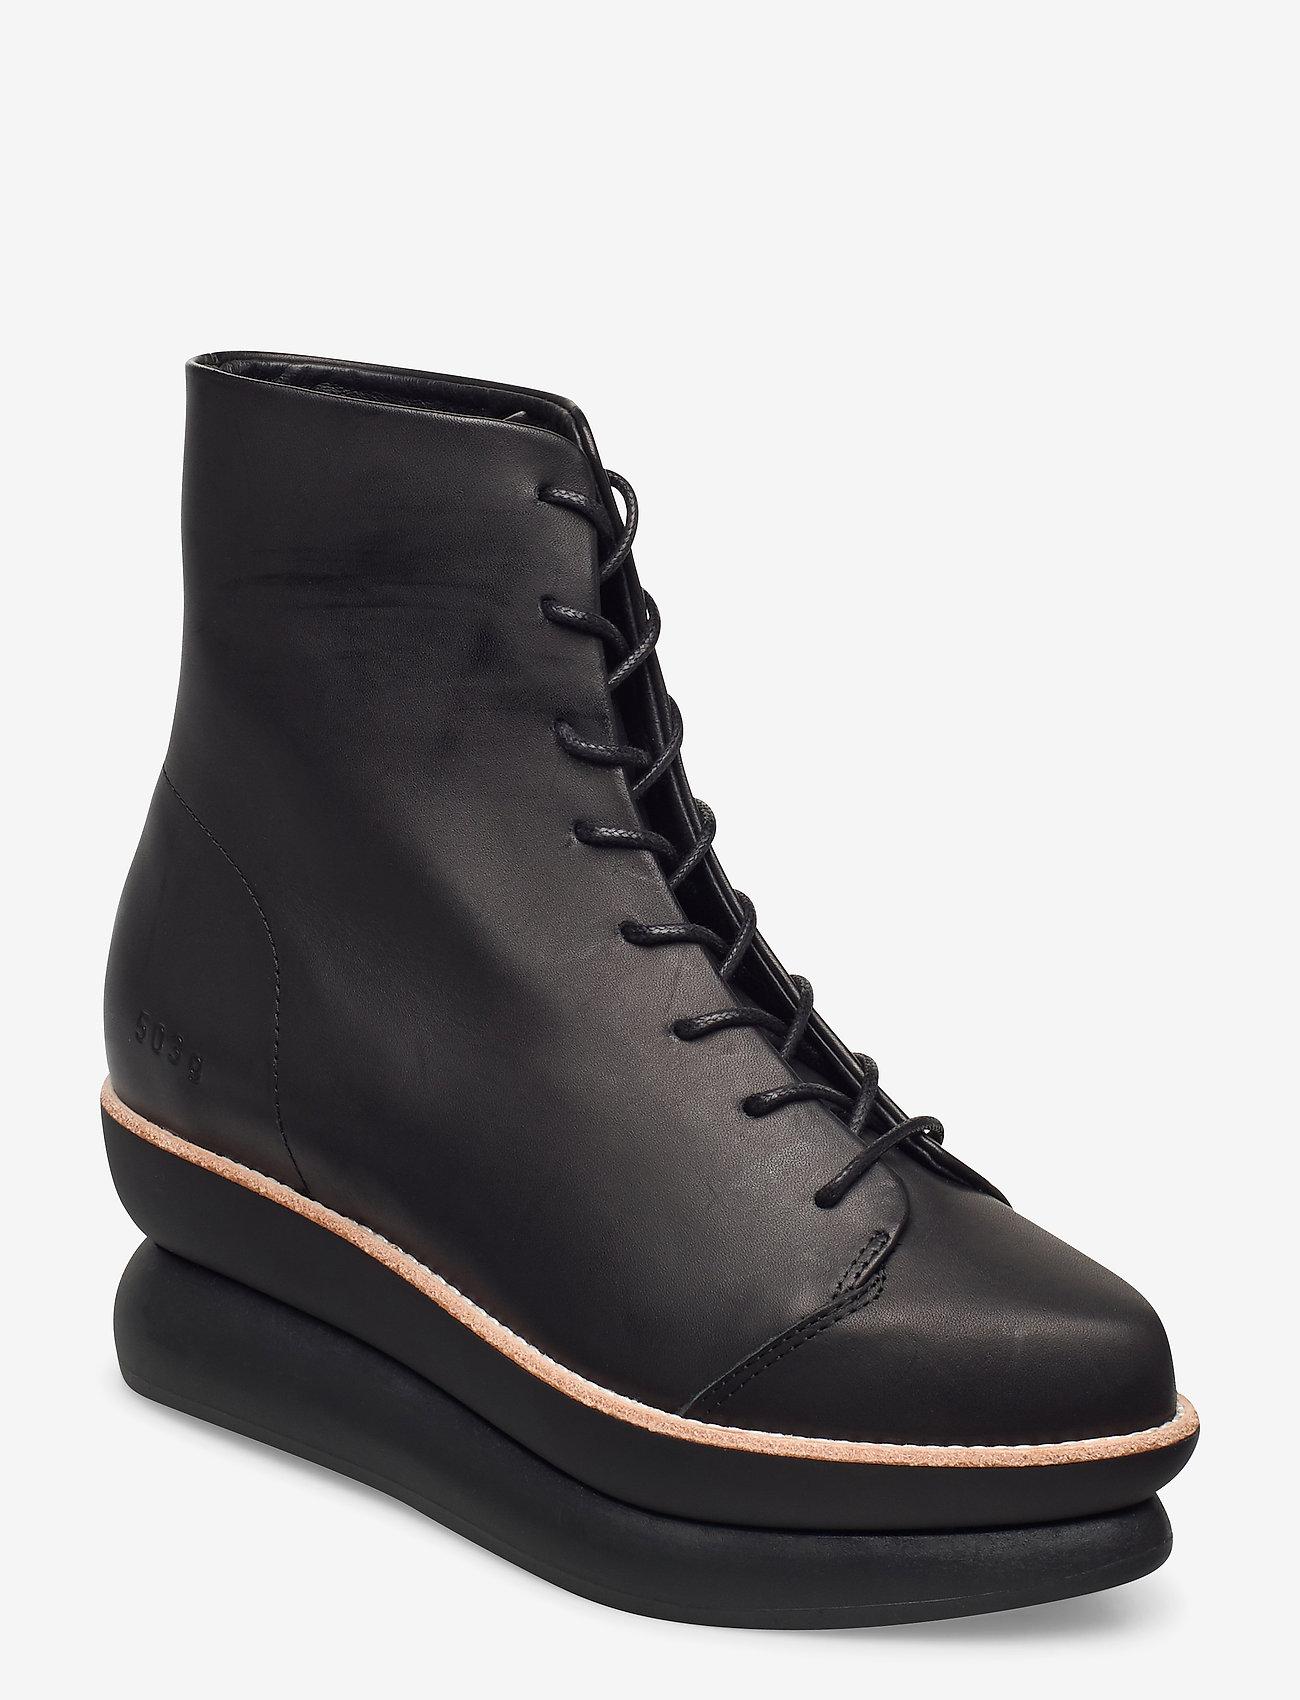 Särskild rabatt503g Lace-up Black Leather Black Leather 1871.25 Gram kLU6w gmalI